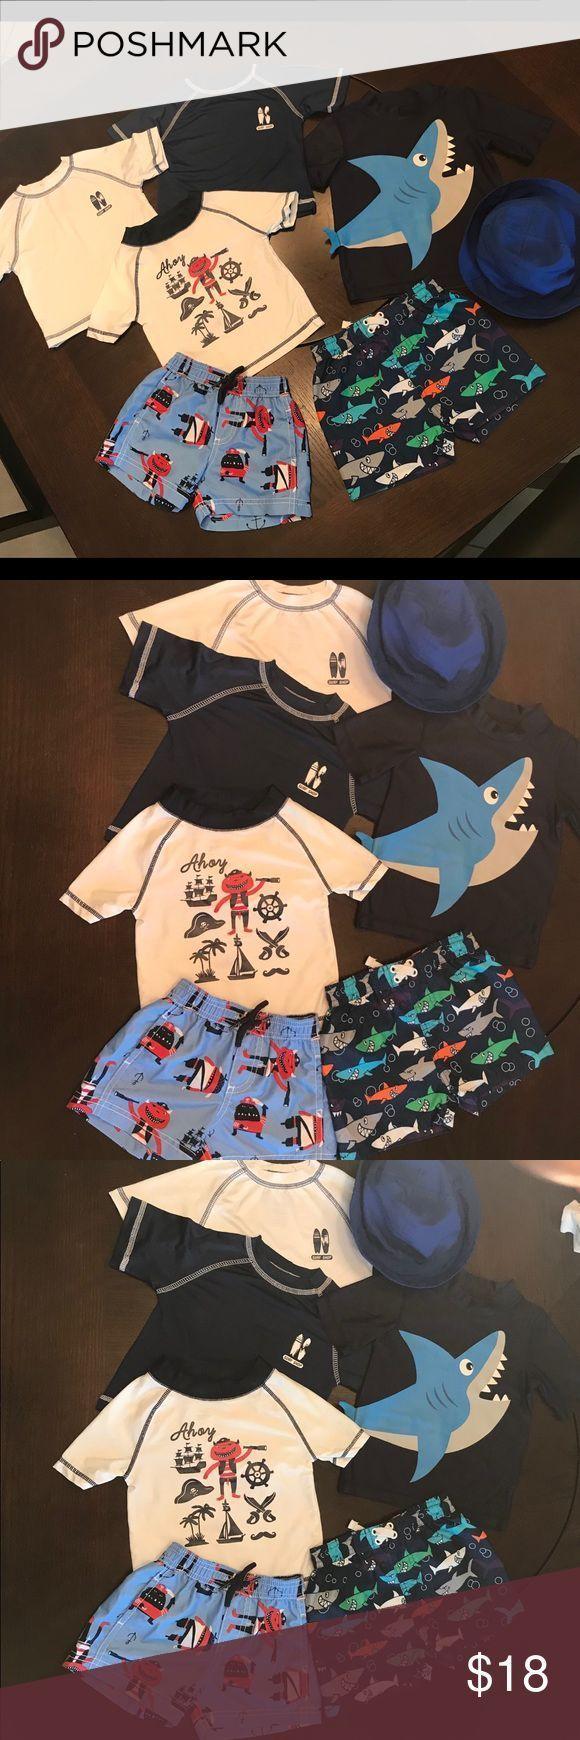 Baby Boy Bademode 7 Stück Bundle Baby Boy Bademode 7 Stück Bundle 4 Kinder   – Women clothes sale